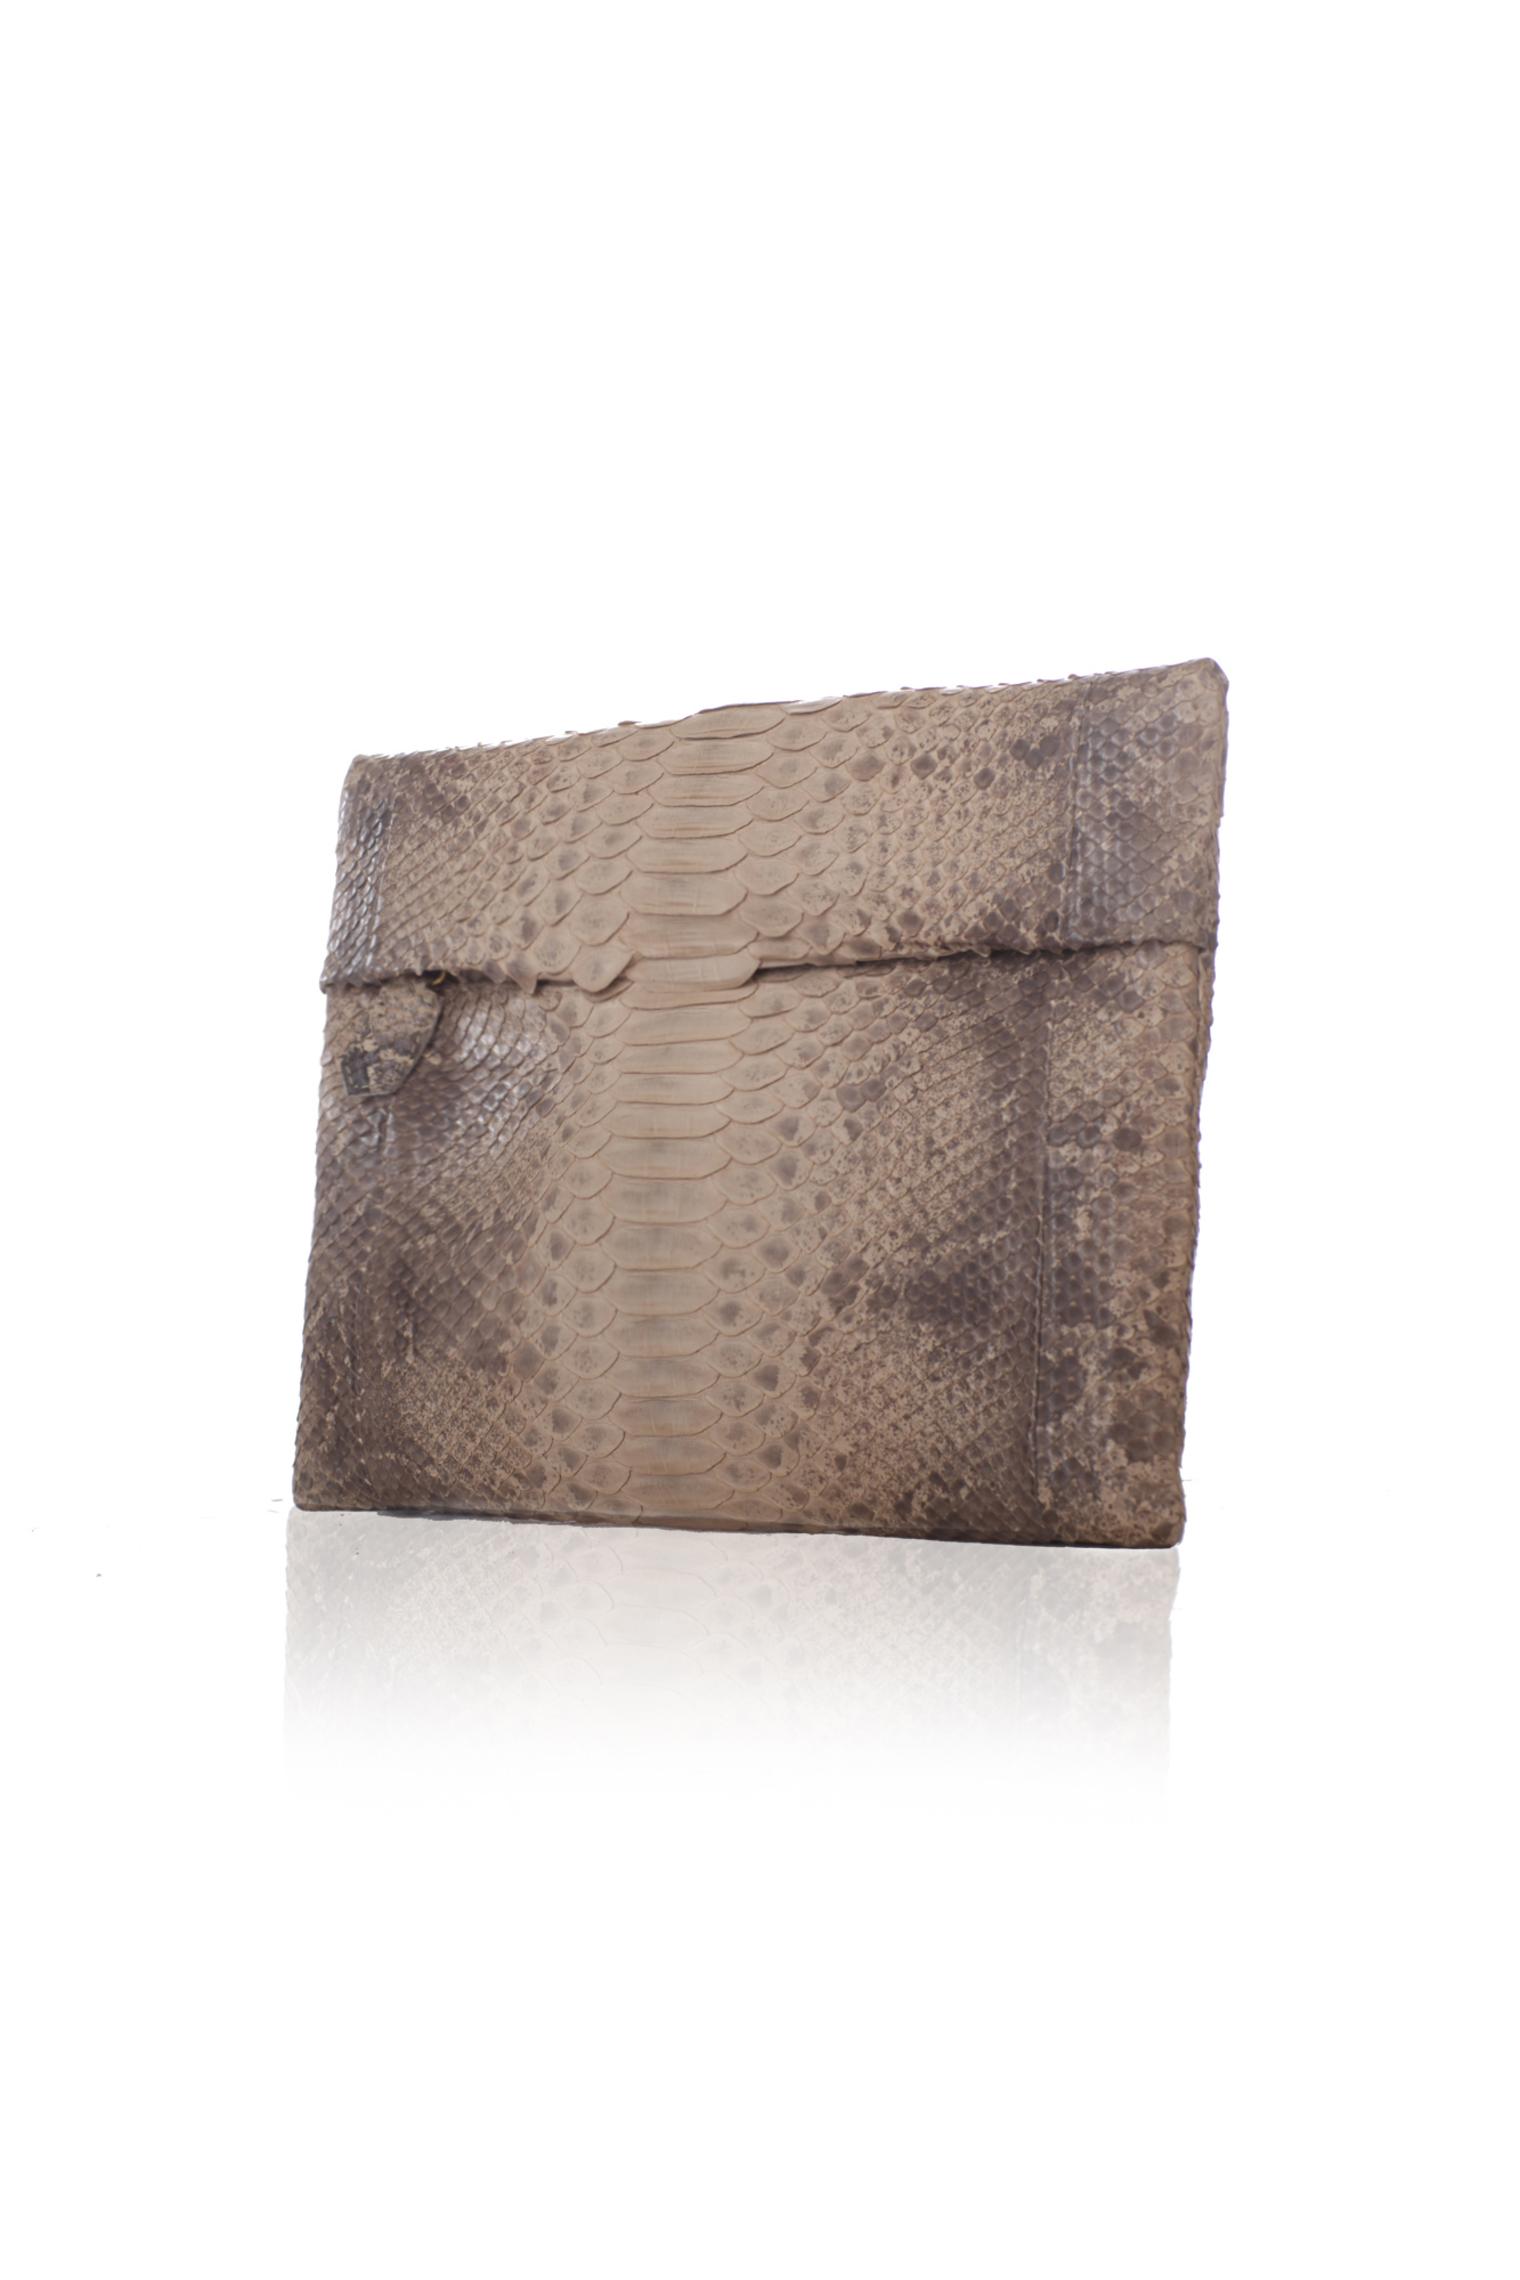 Folder Clutch PM - Nude Ombre